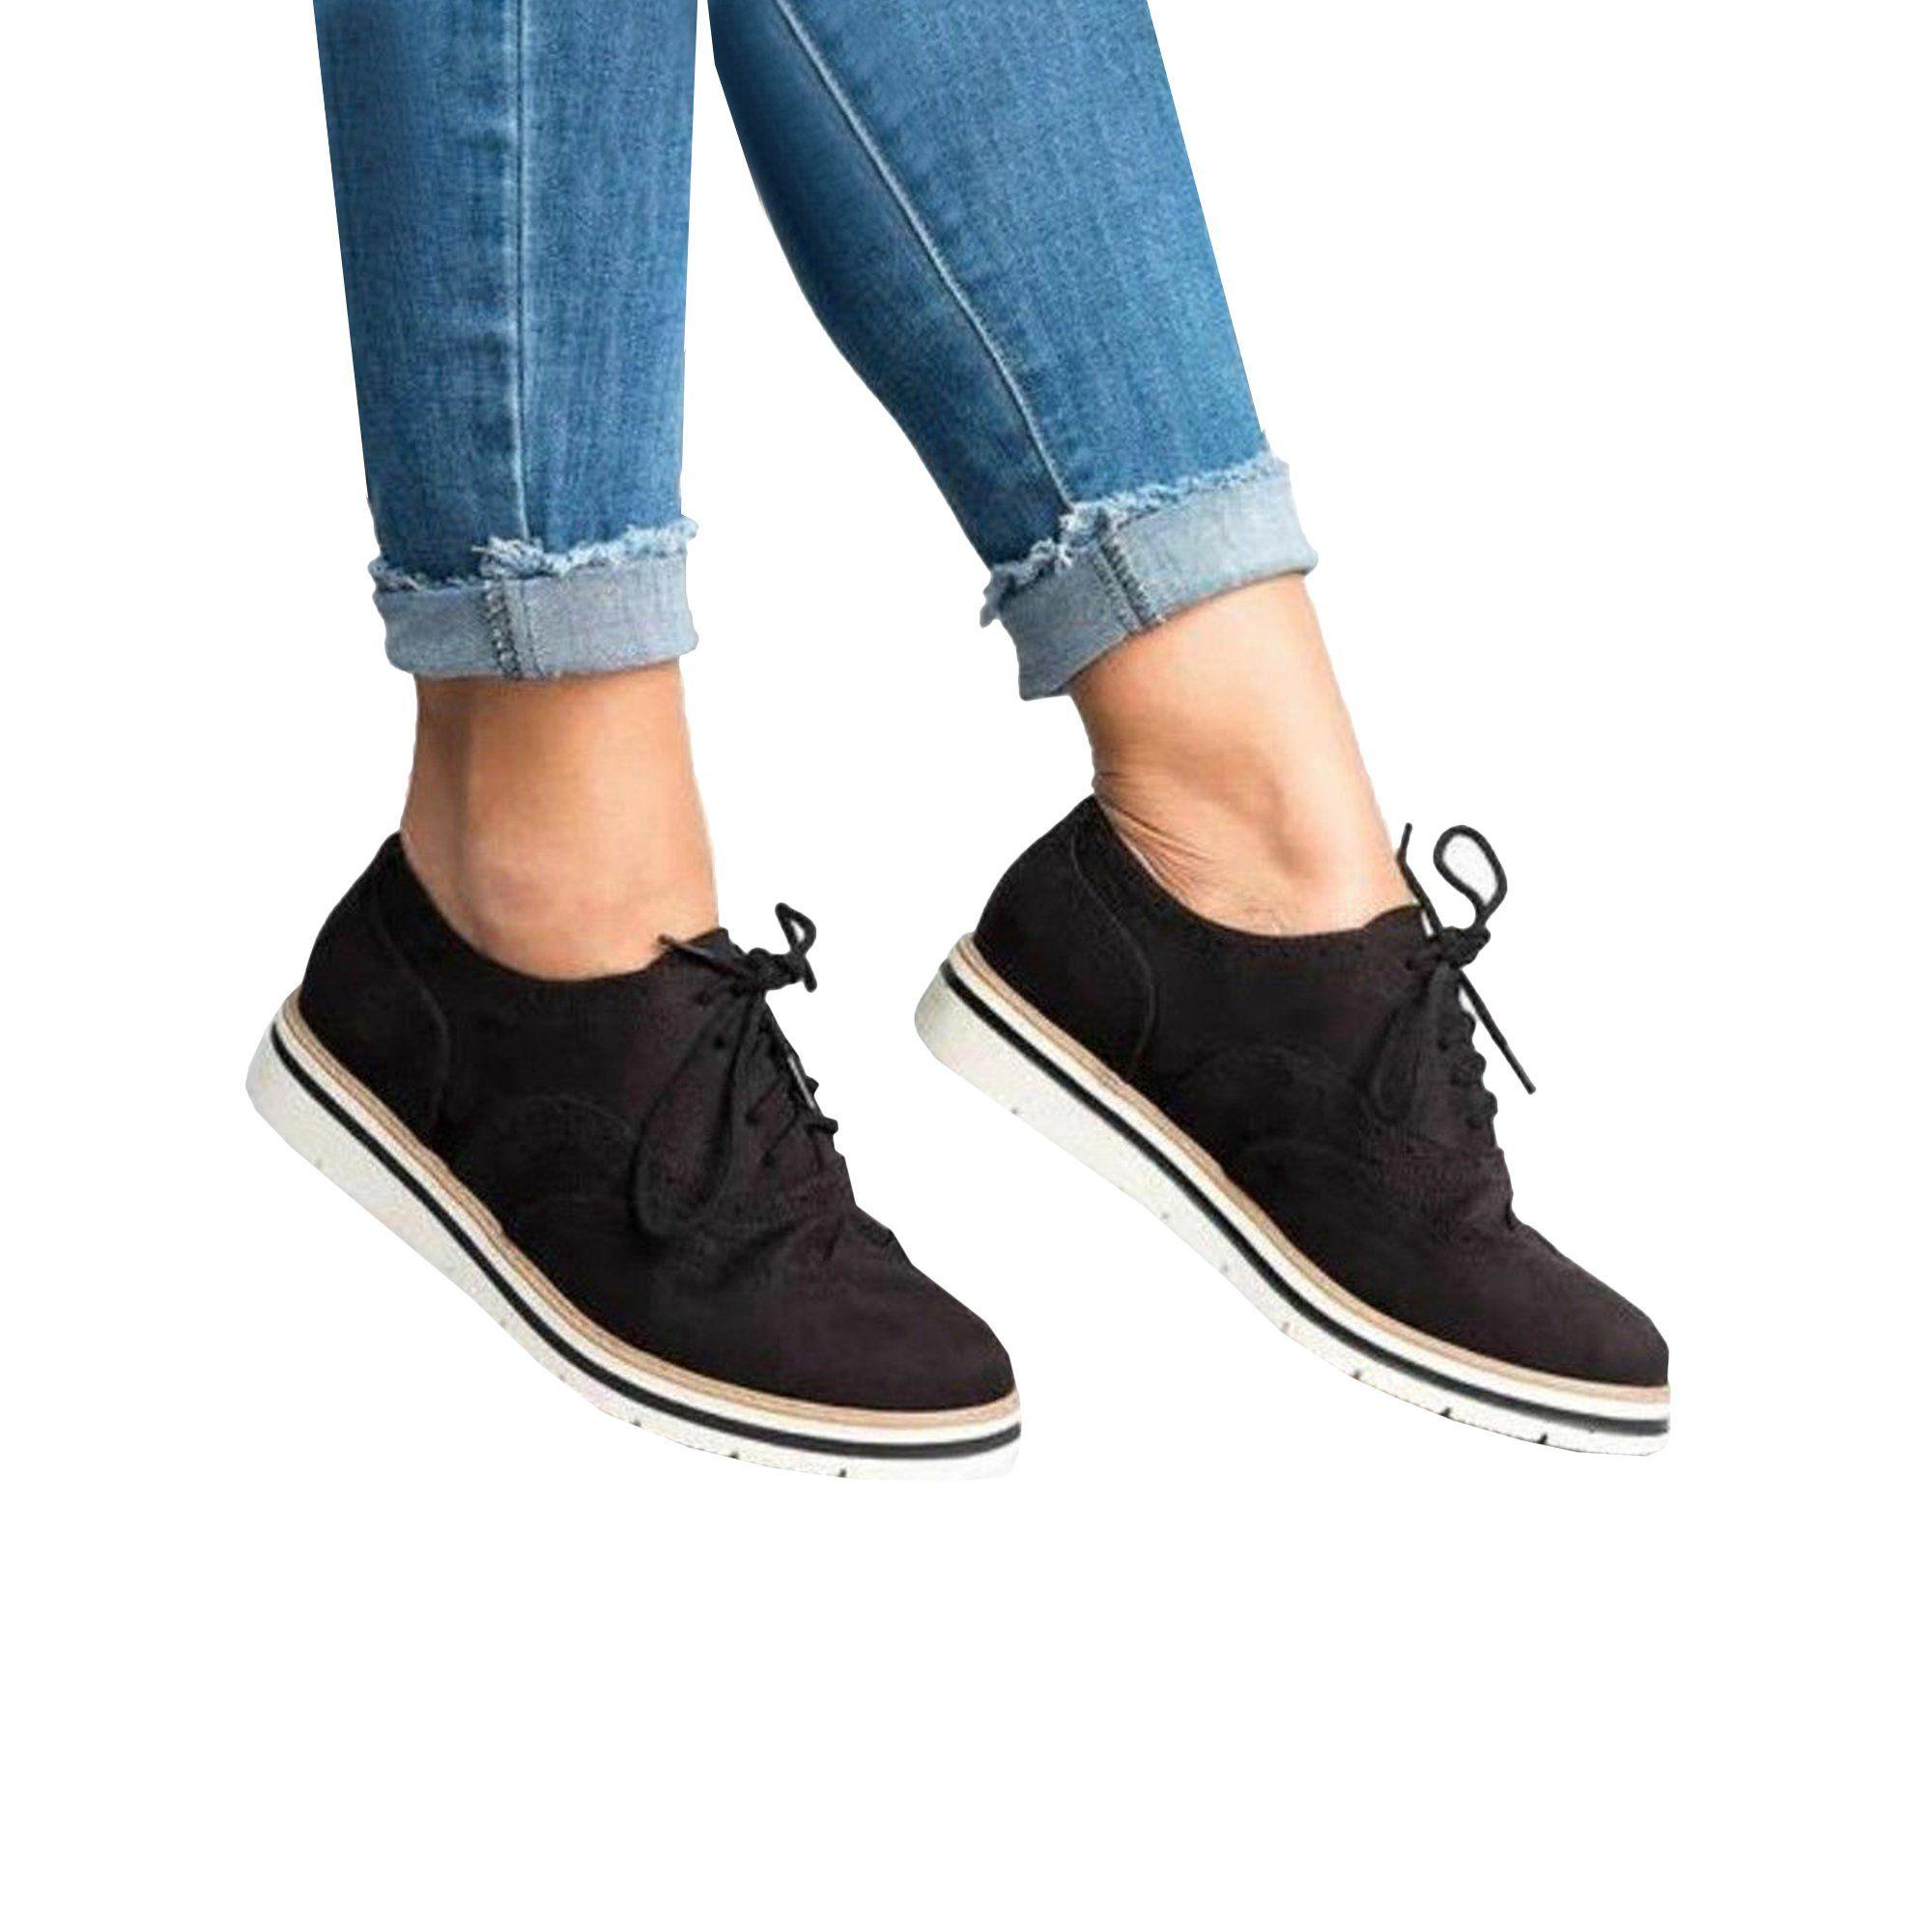 Lallc Women S Oxfords Lace Up Flat Smart Work Sports Brogue Trainers Casual Shoes Walmart Com Casual Sneakers Women Business Casual Shoes Women Work Shoes Women [ 2000 x 2000 Pixel ]